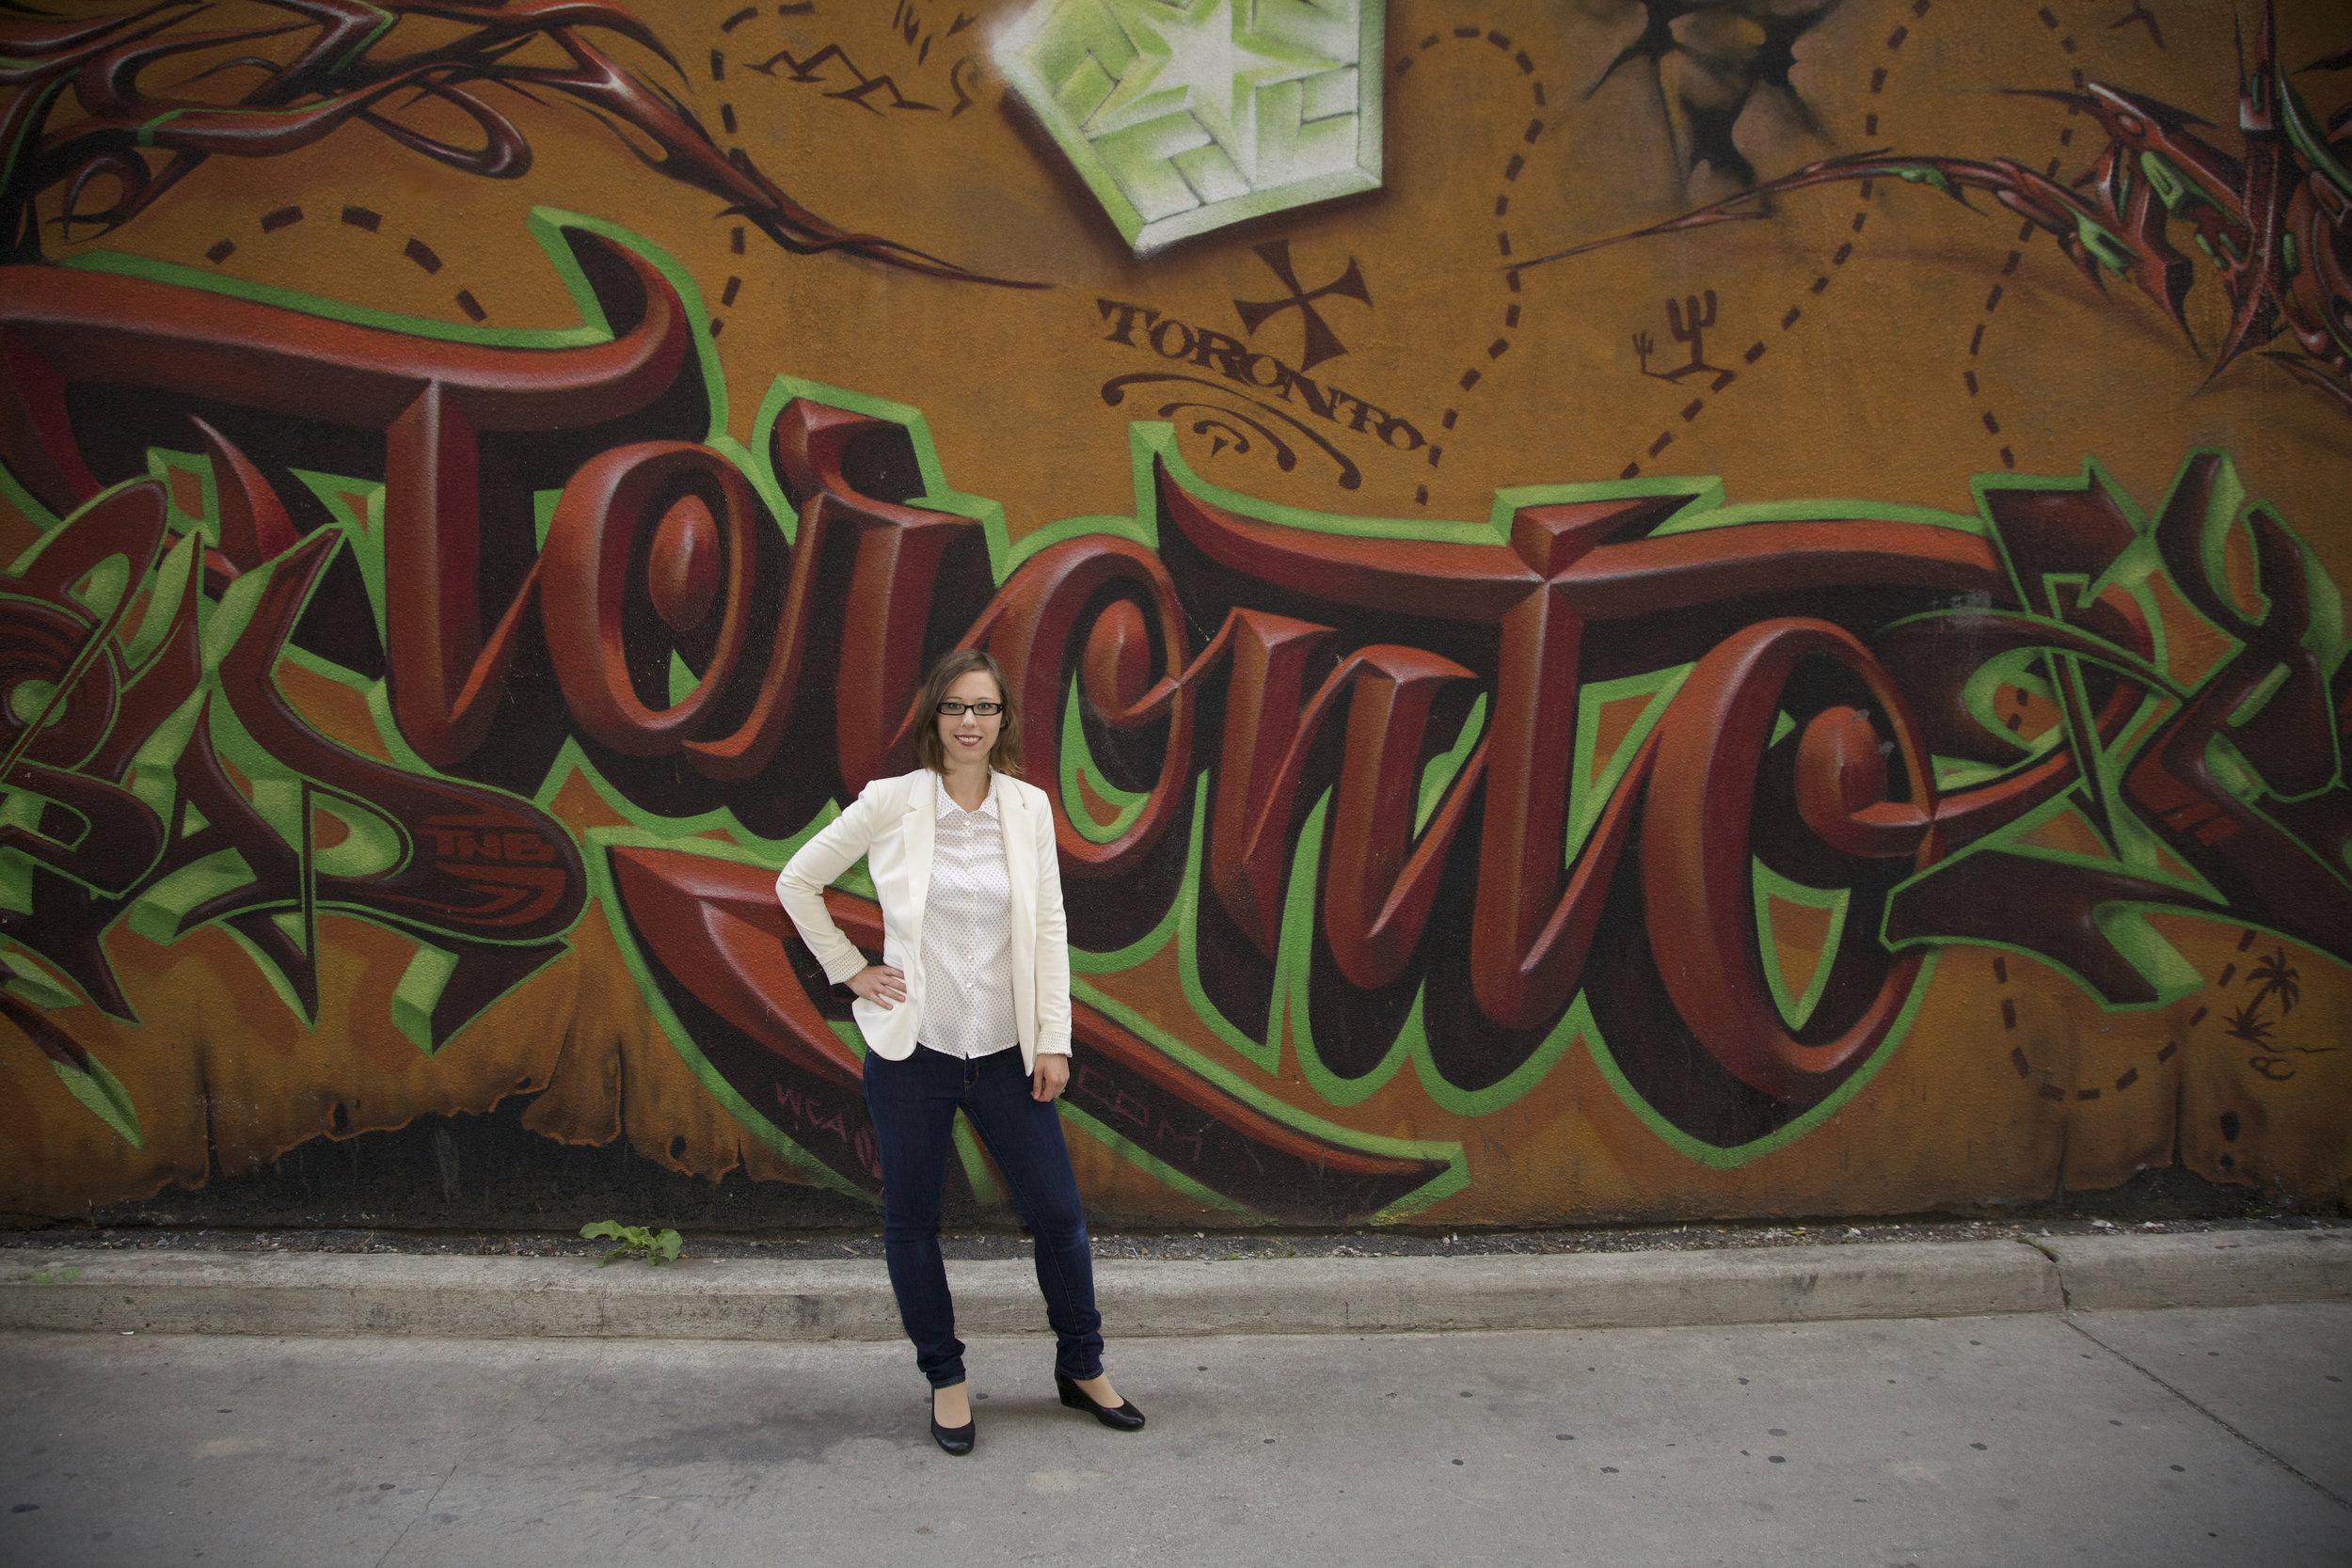 Liz Toronto graffity small.jpg